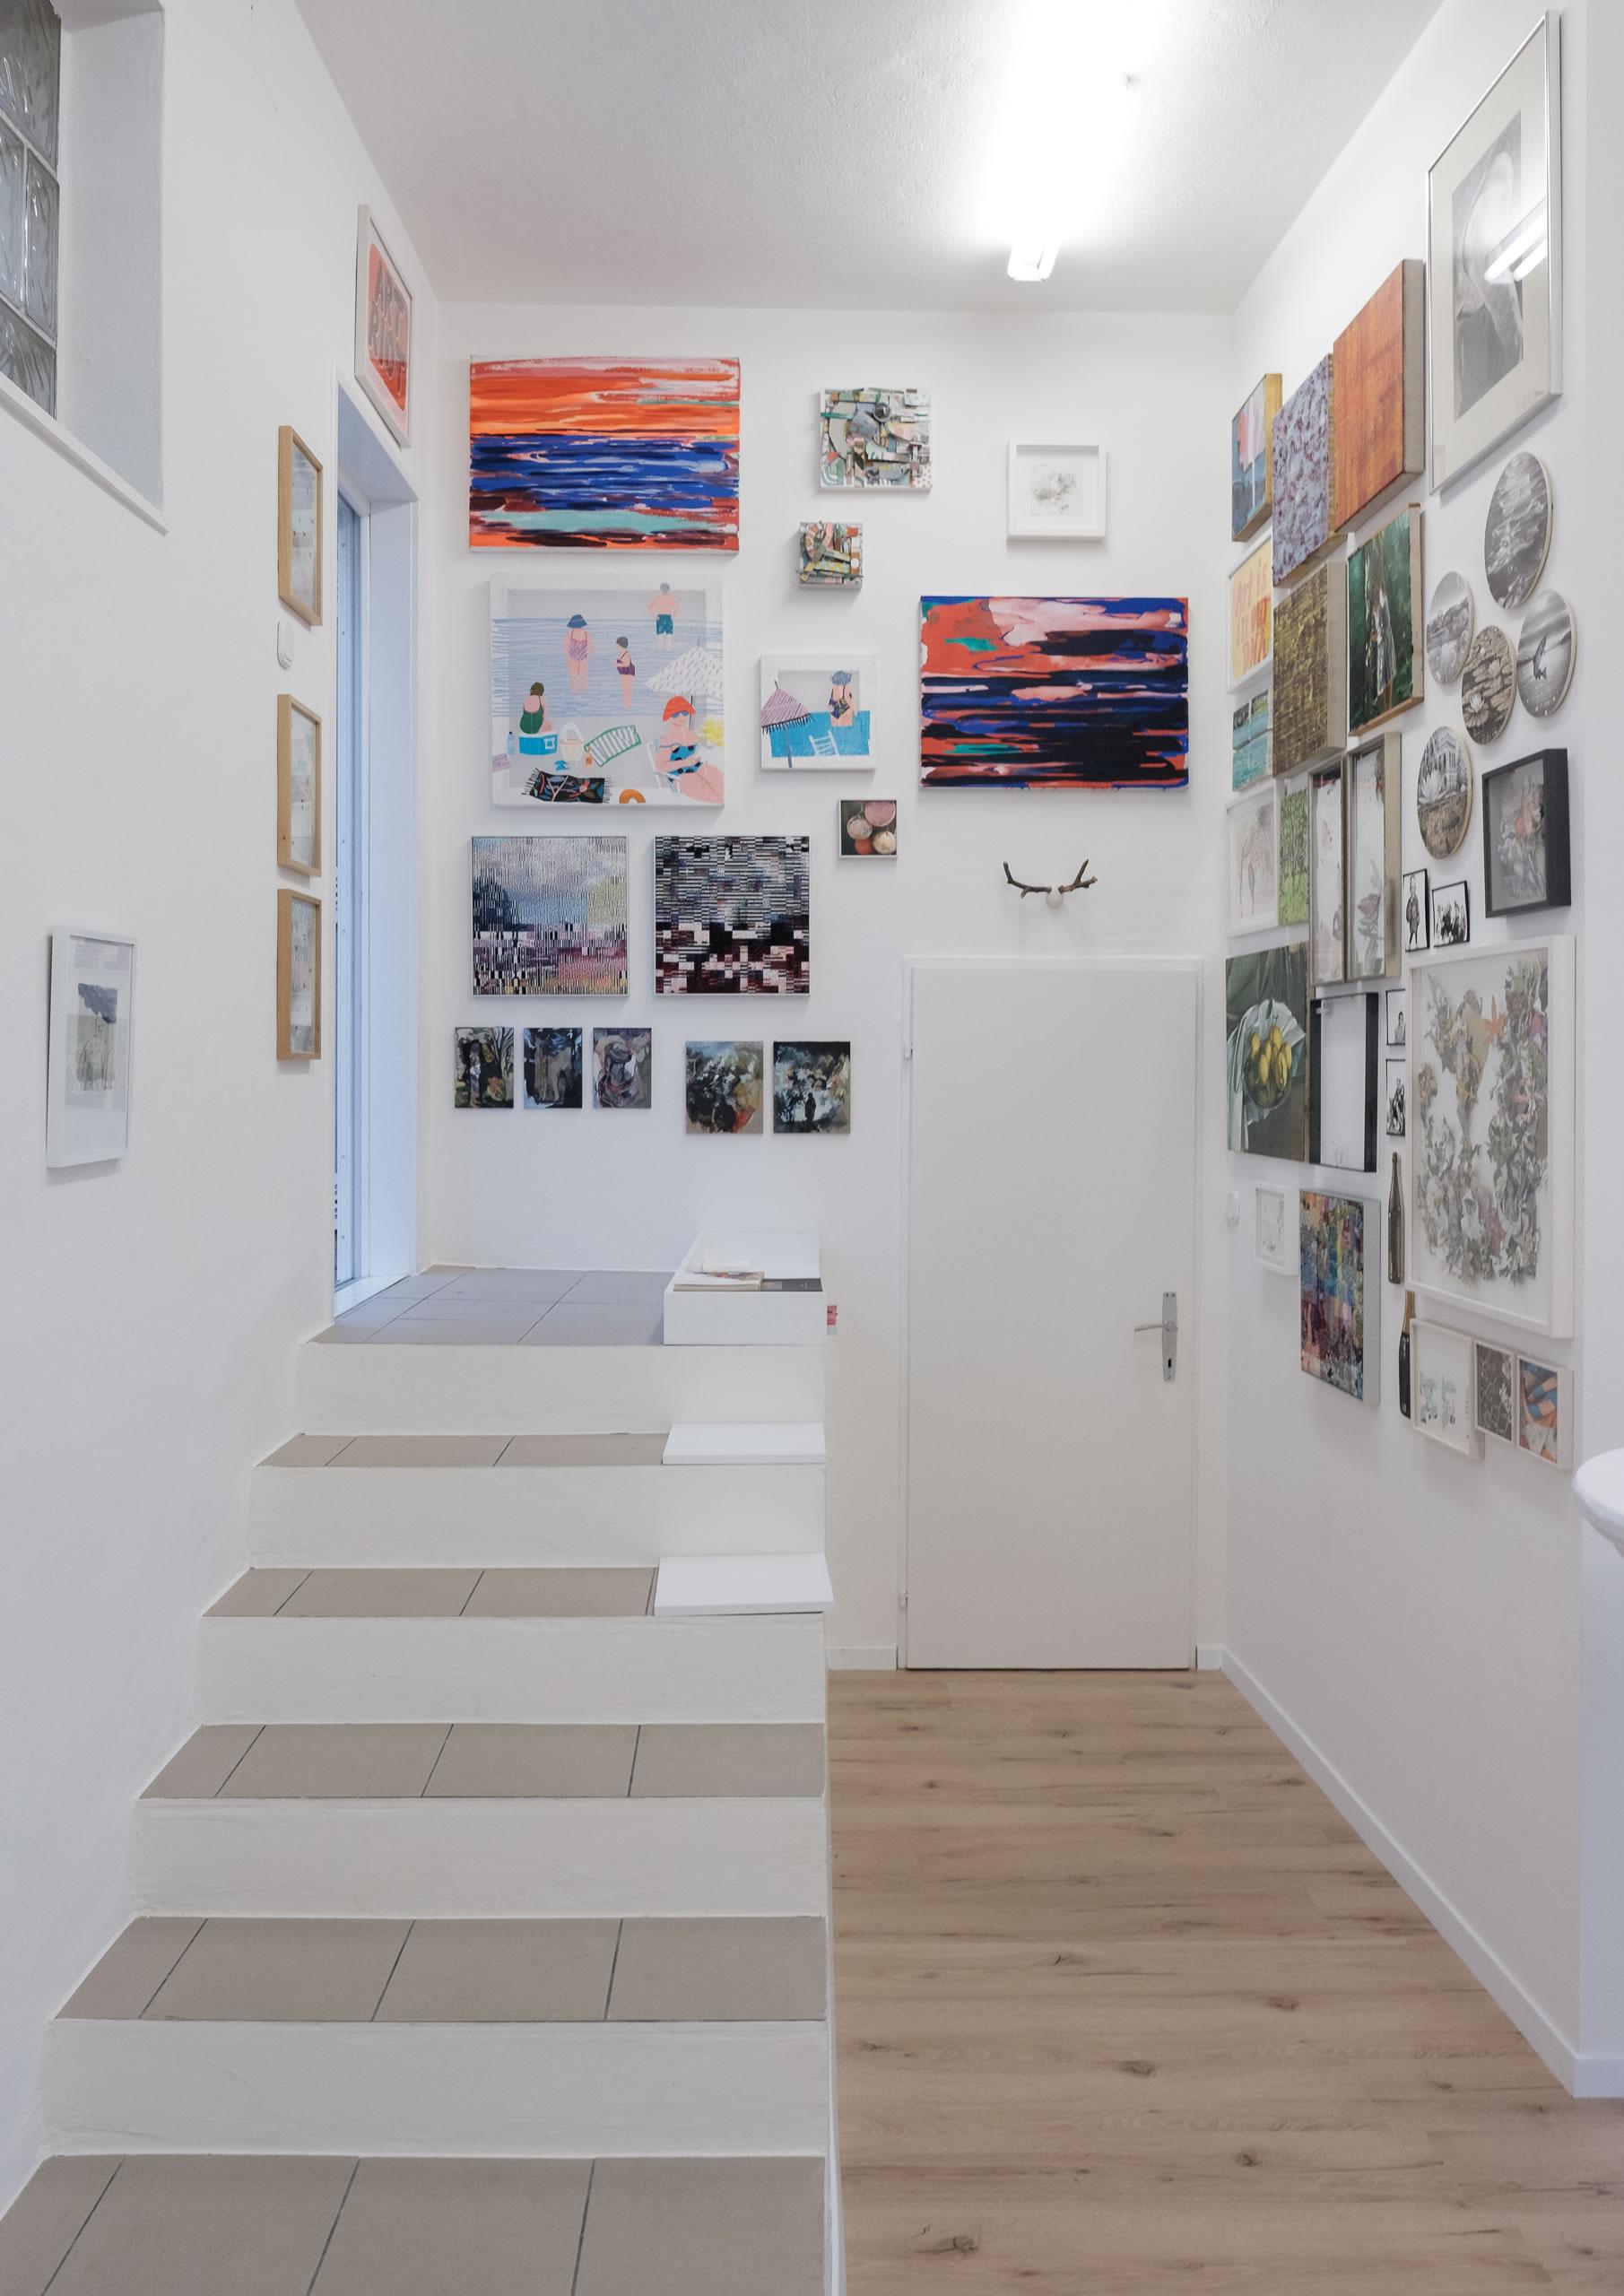 3. Törn | Foto Manu Lasnik | 2019 | Galerie3